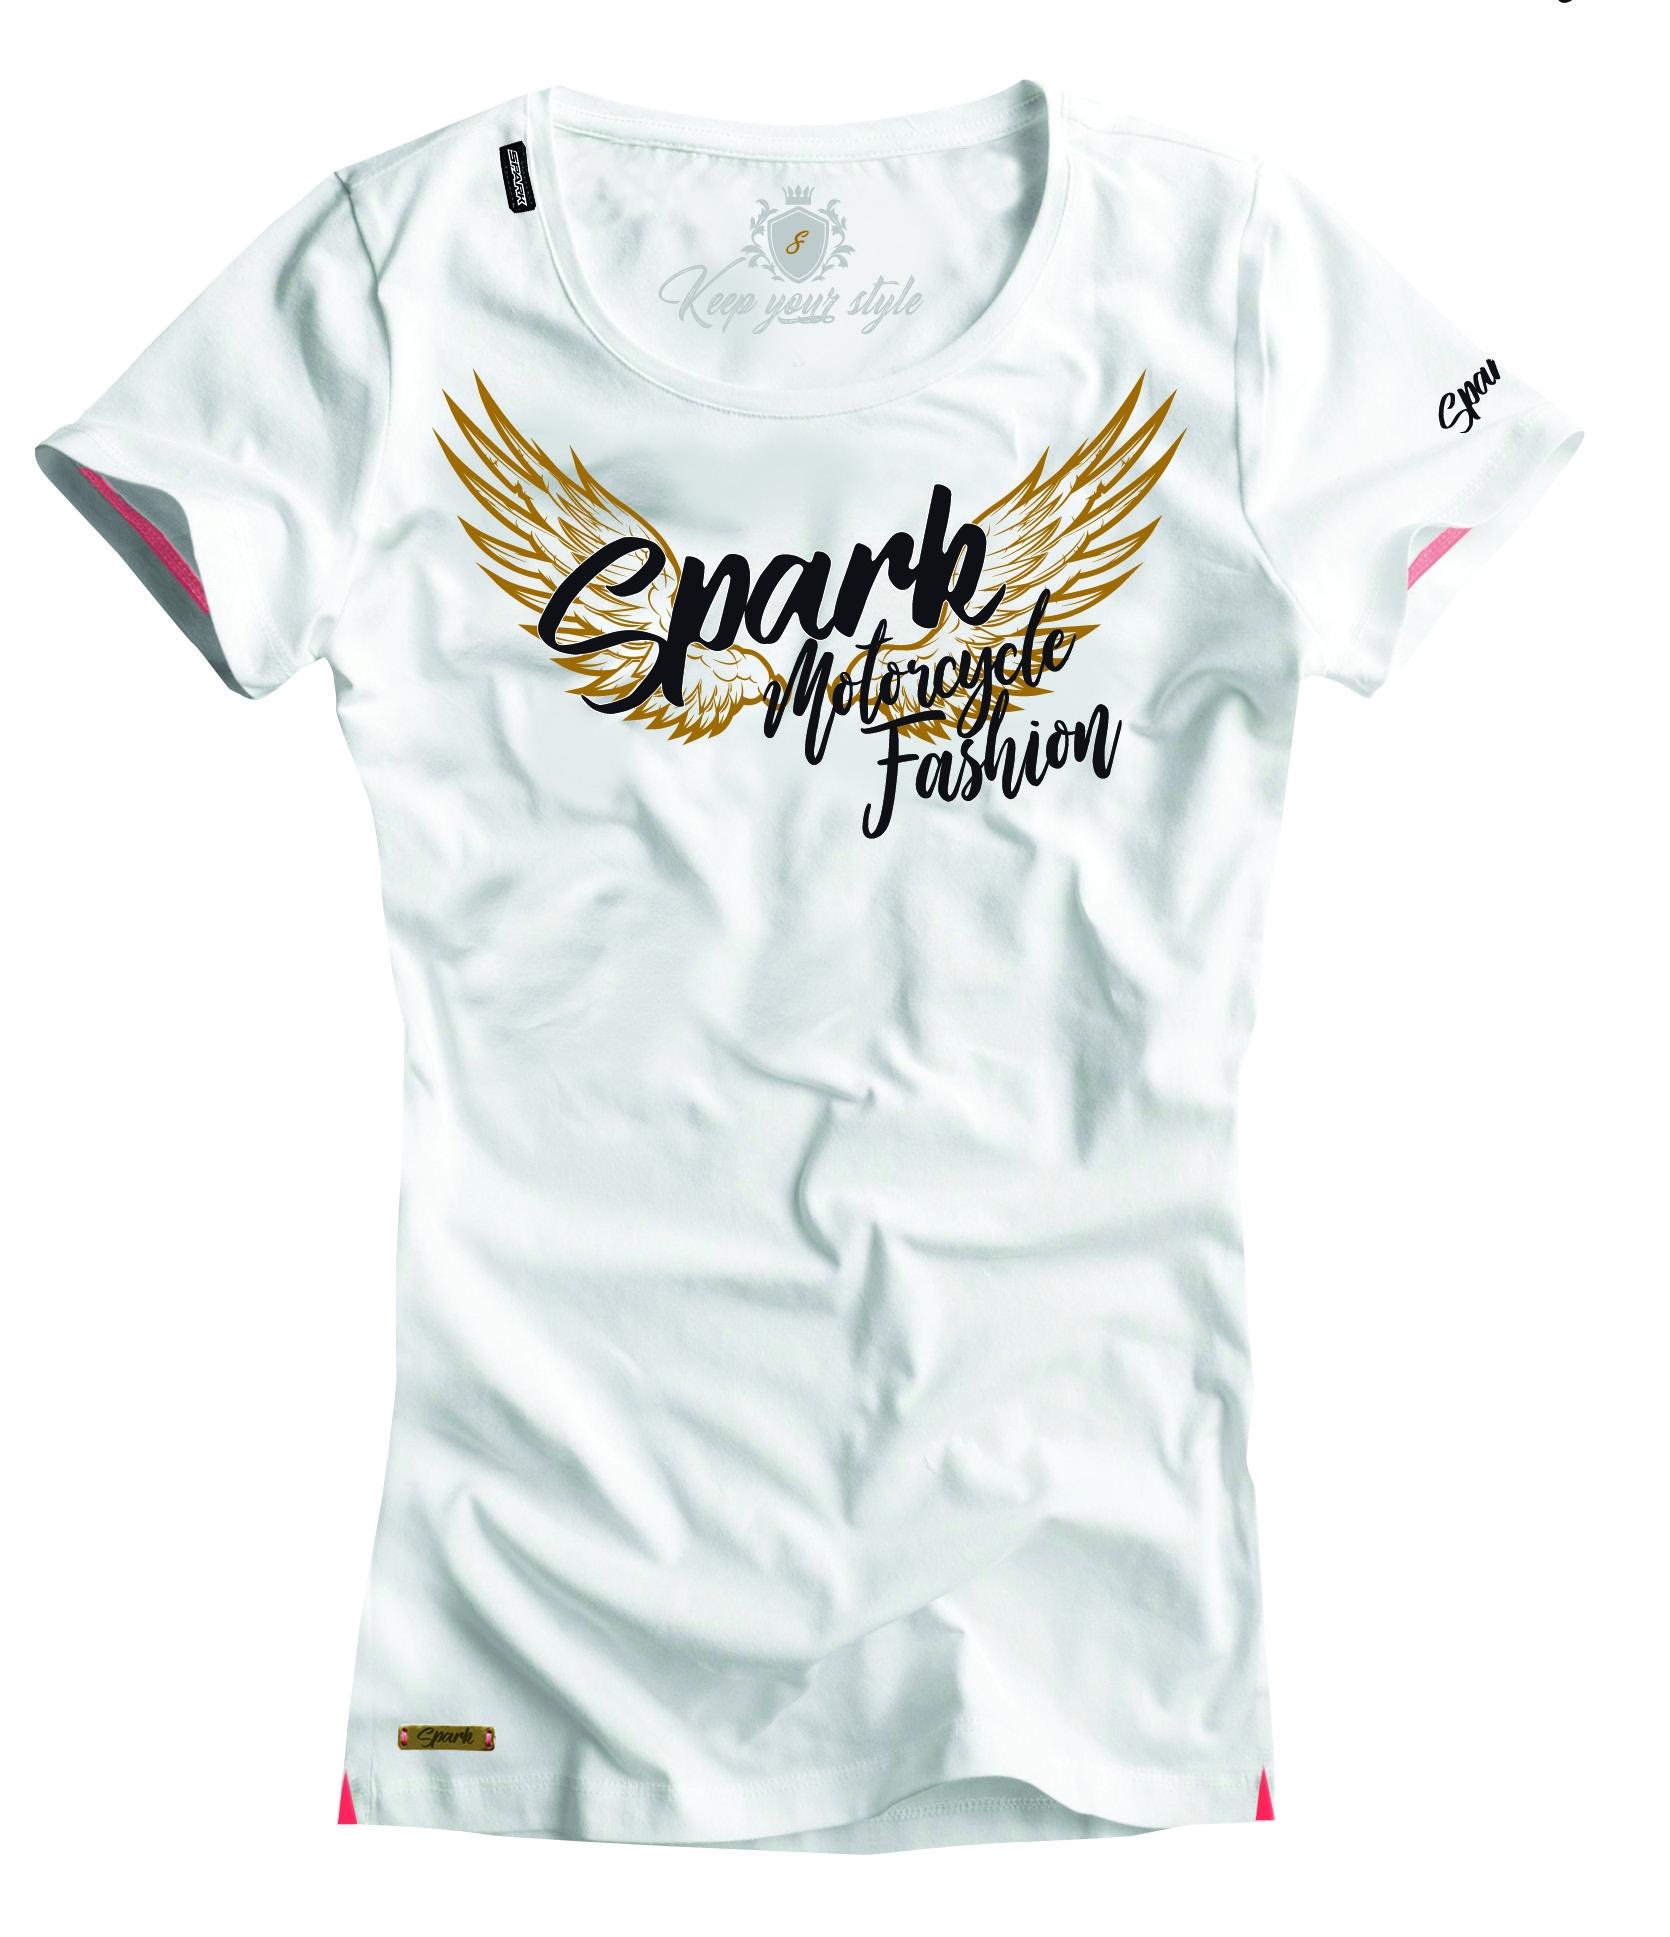 Dámské tričko Spark D 011, bílé